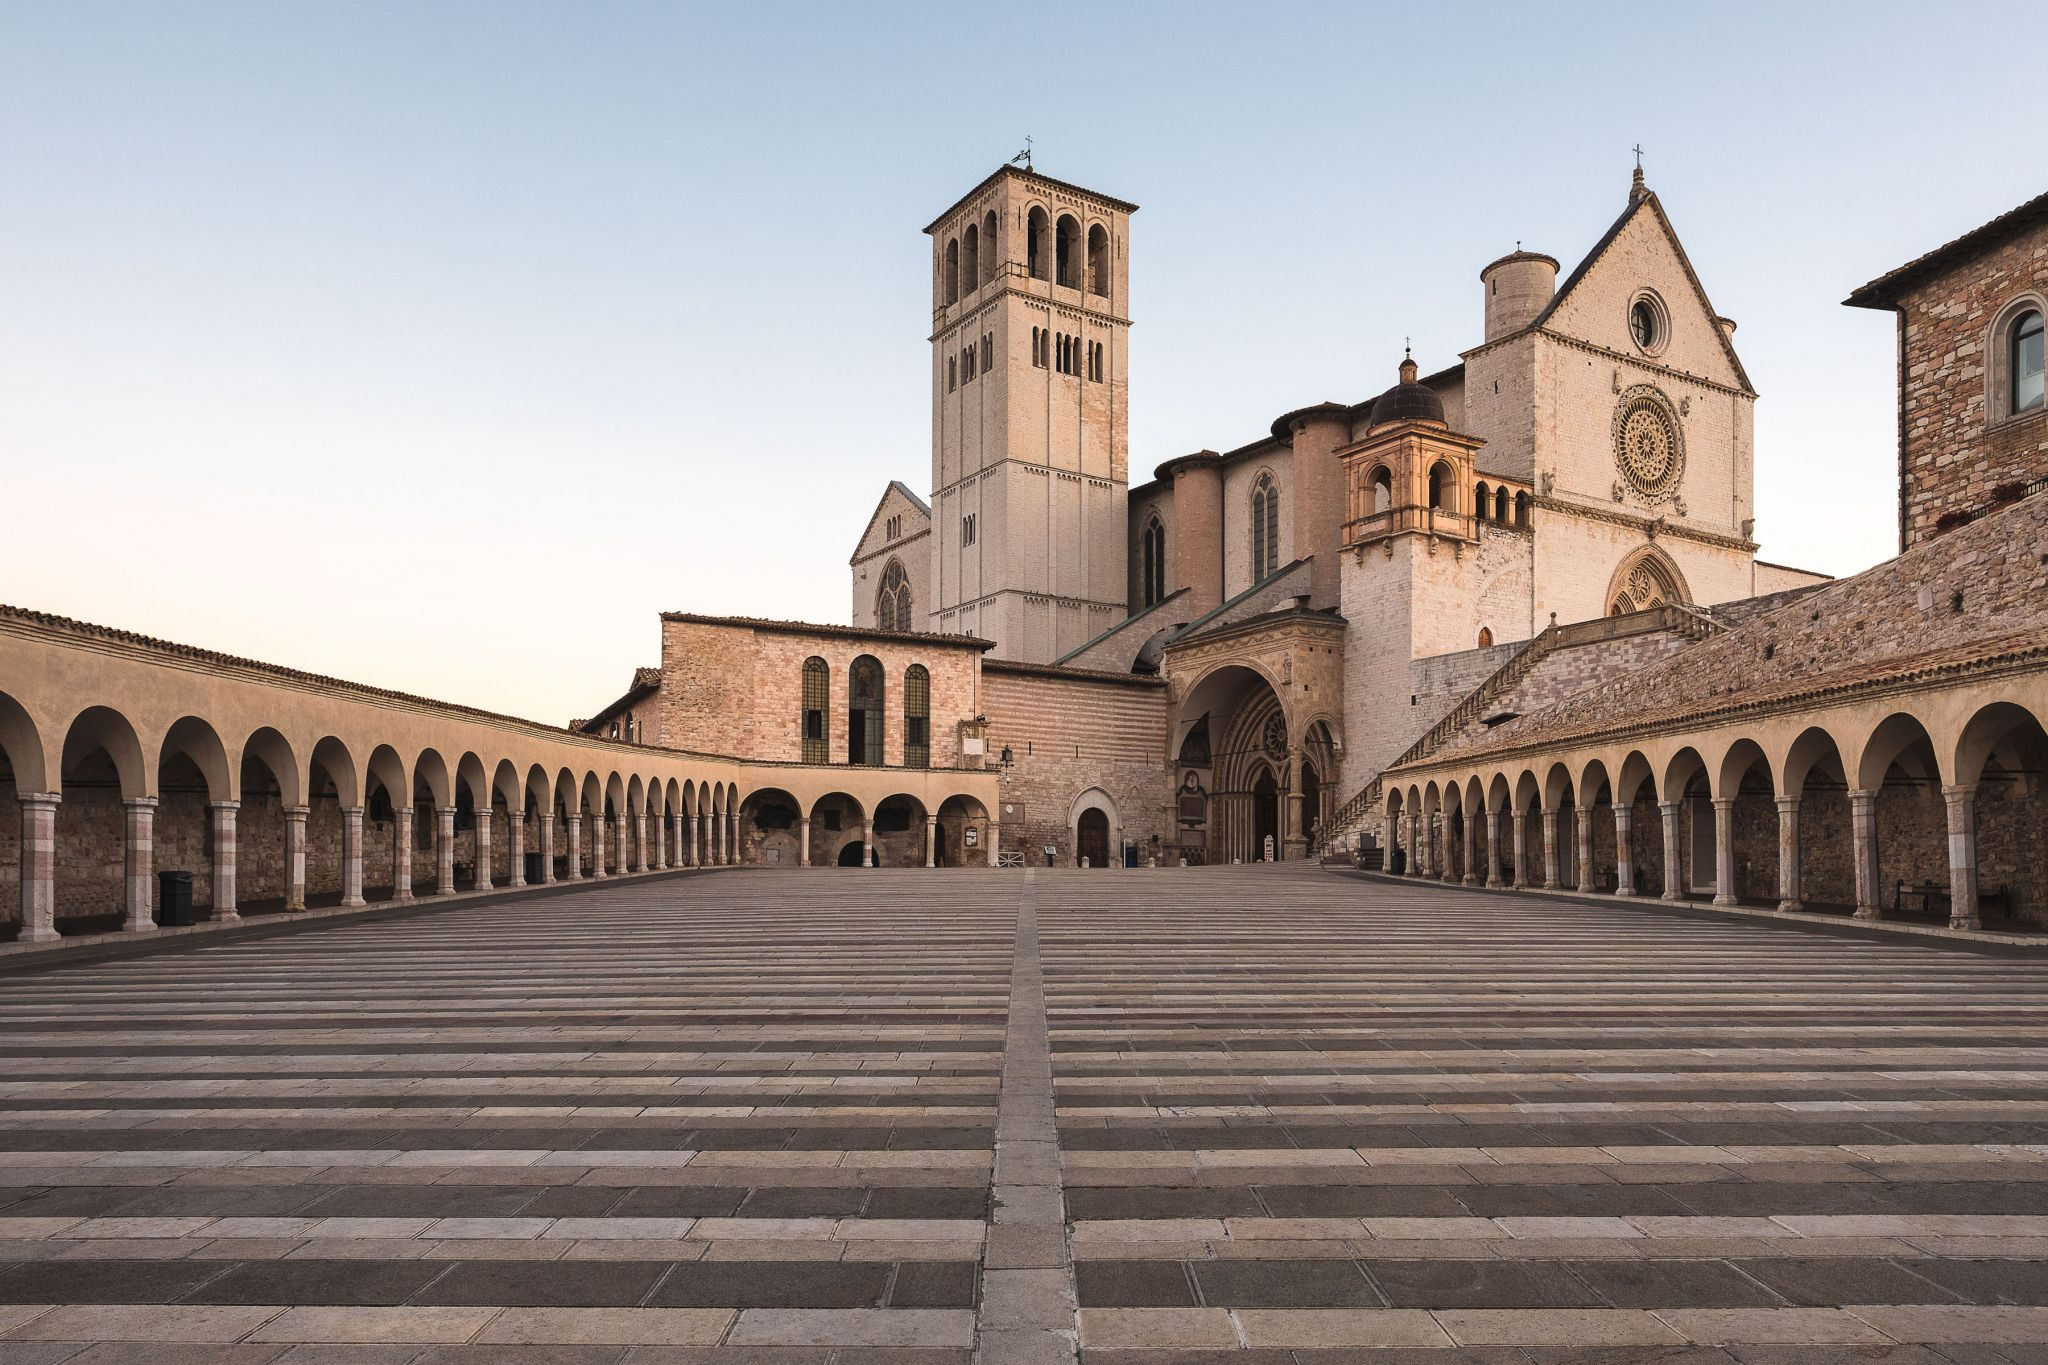 The Basilica of San Francesco, Italy